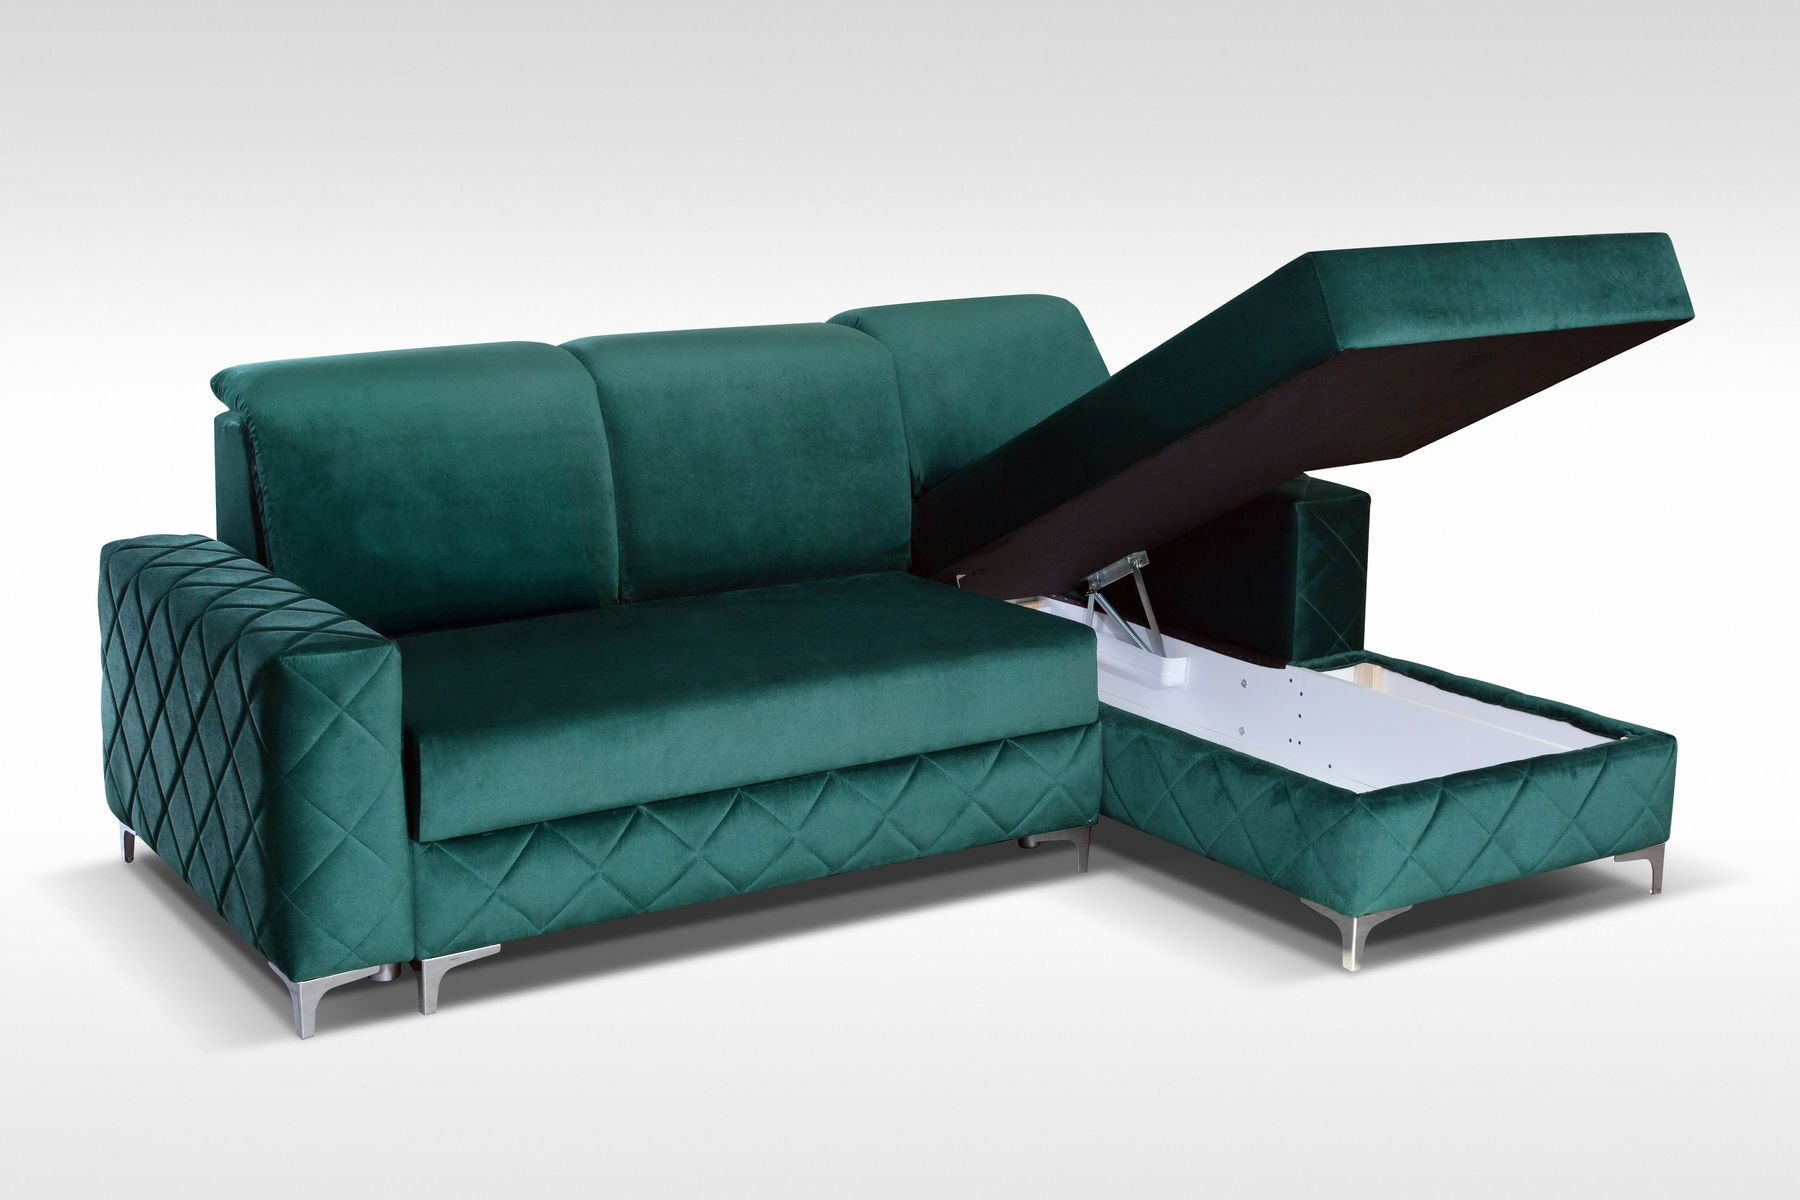 Alfredo Mini Gray Lf Sectional Sofa Sectional Sleeper Sofa Sectional Sofa Sleeper Sectional